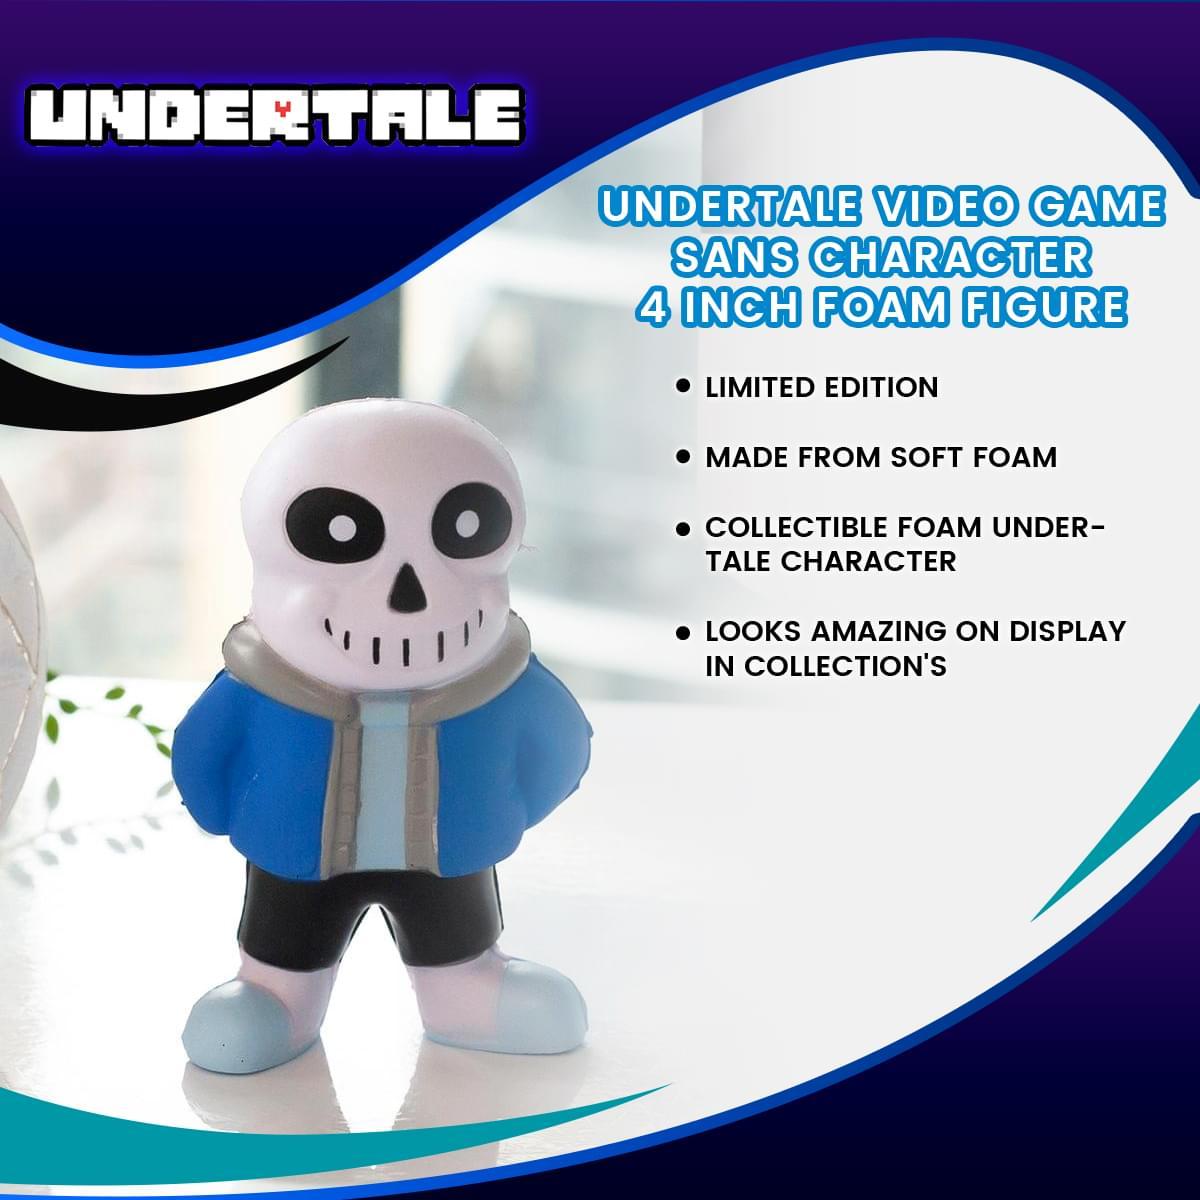 Undertale Video Game | Sans Character | 4 Inch Foam Figure